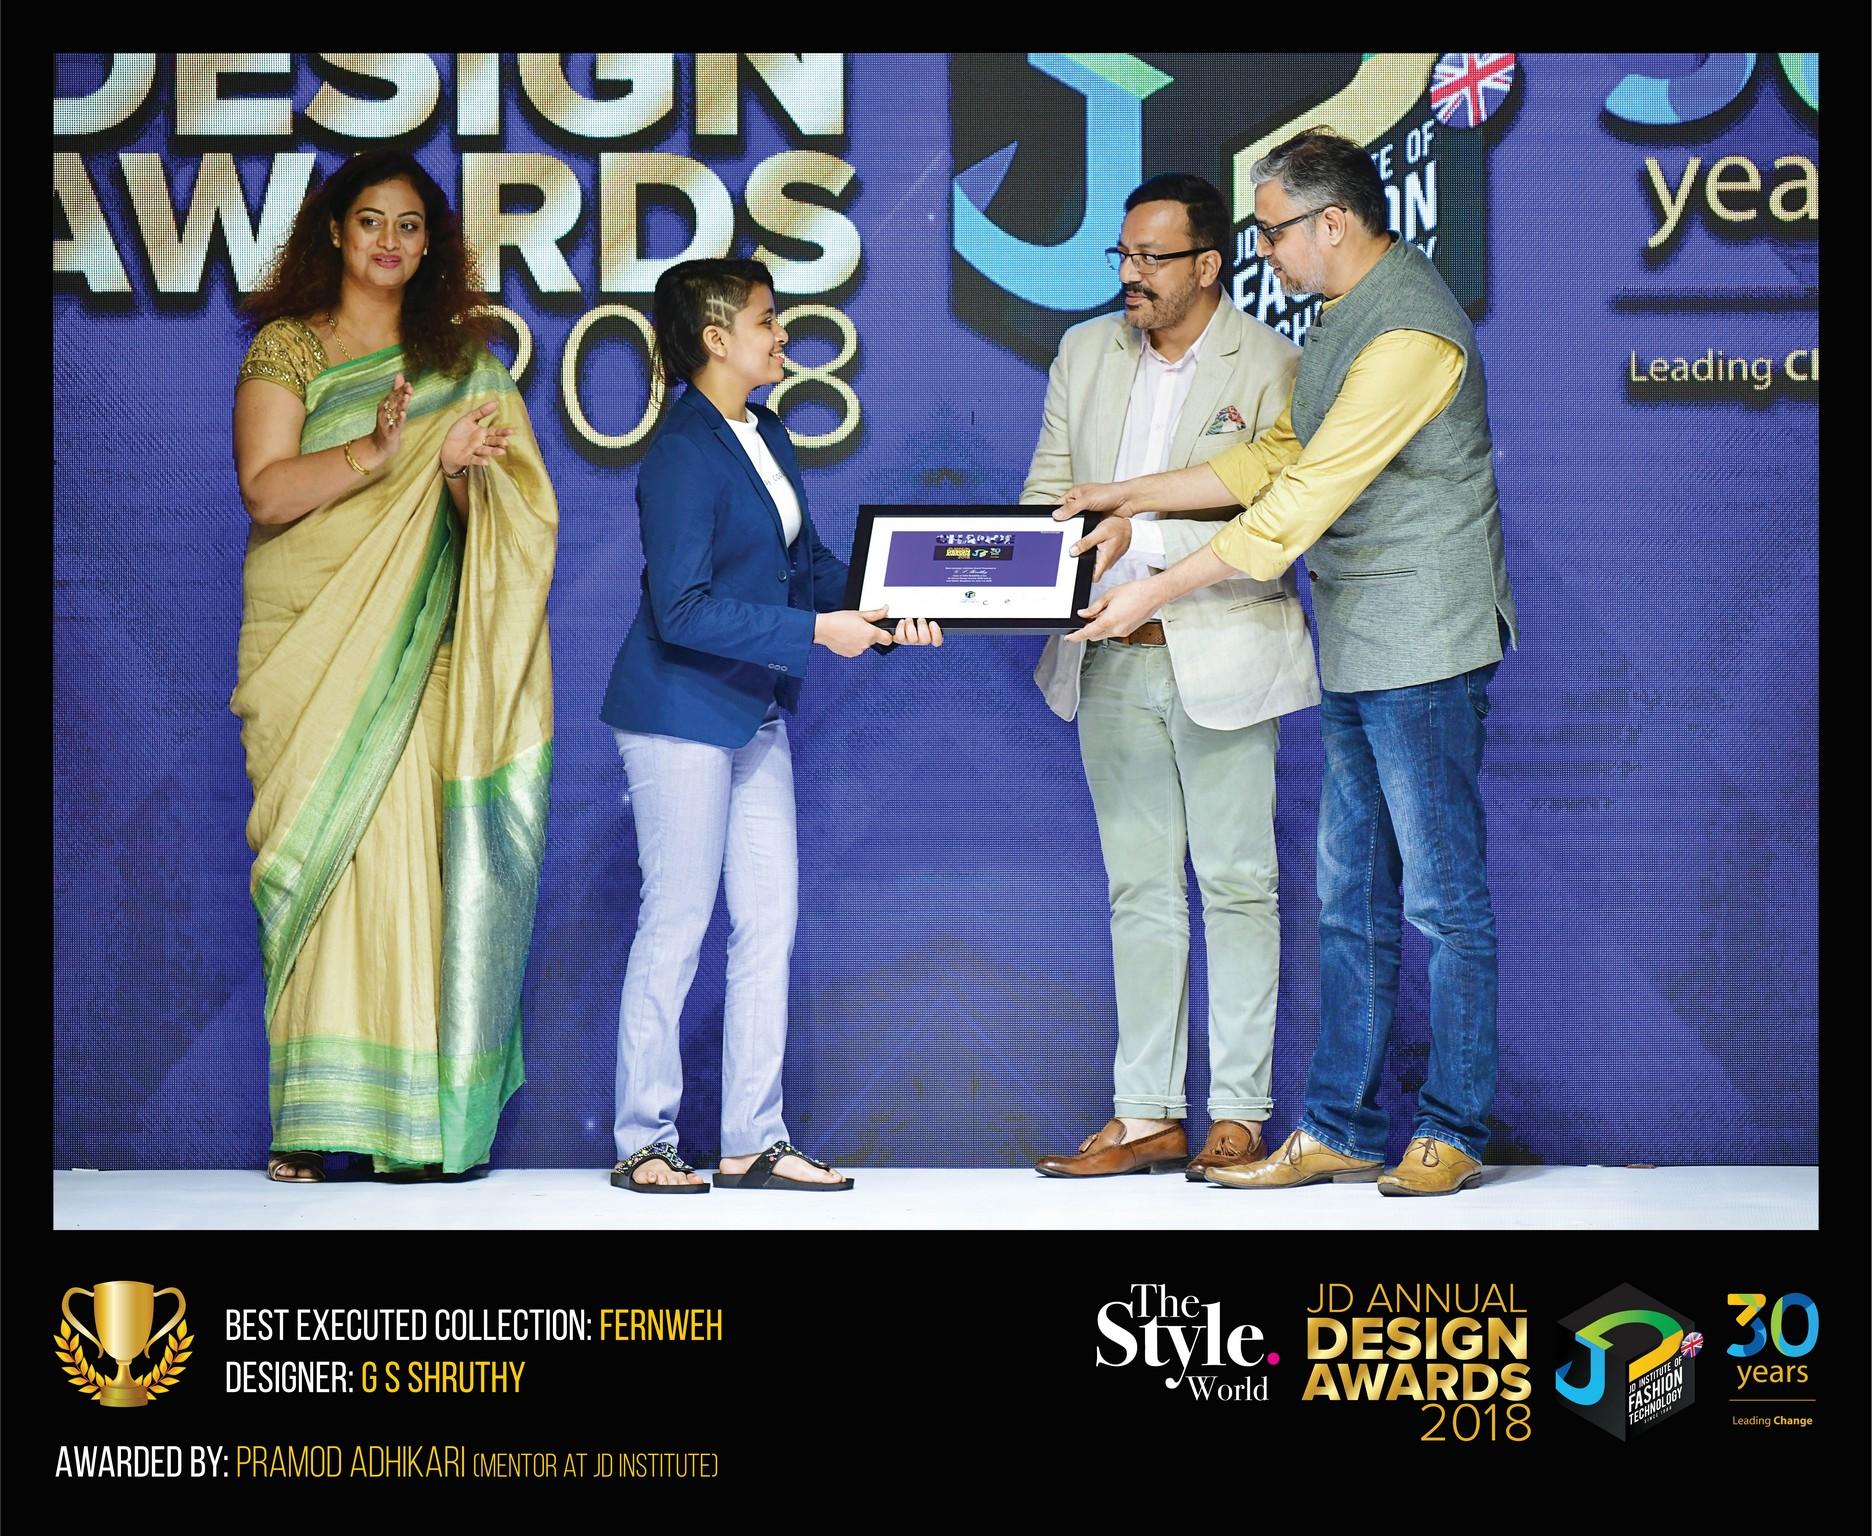 Fernweh – Change – JD Annual Design Awards 2018   Designer: G.S Shruthi (ADFD 2015 Batch)   Photography : Jerin Nath (@jerin_nath) fernweh - 4 - Fernweh – Change – JD Annual Design Awards 2018